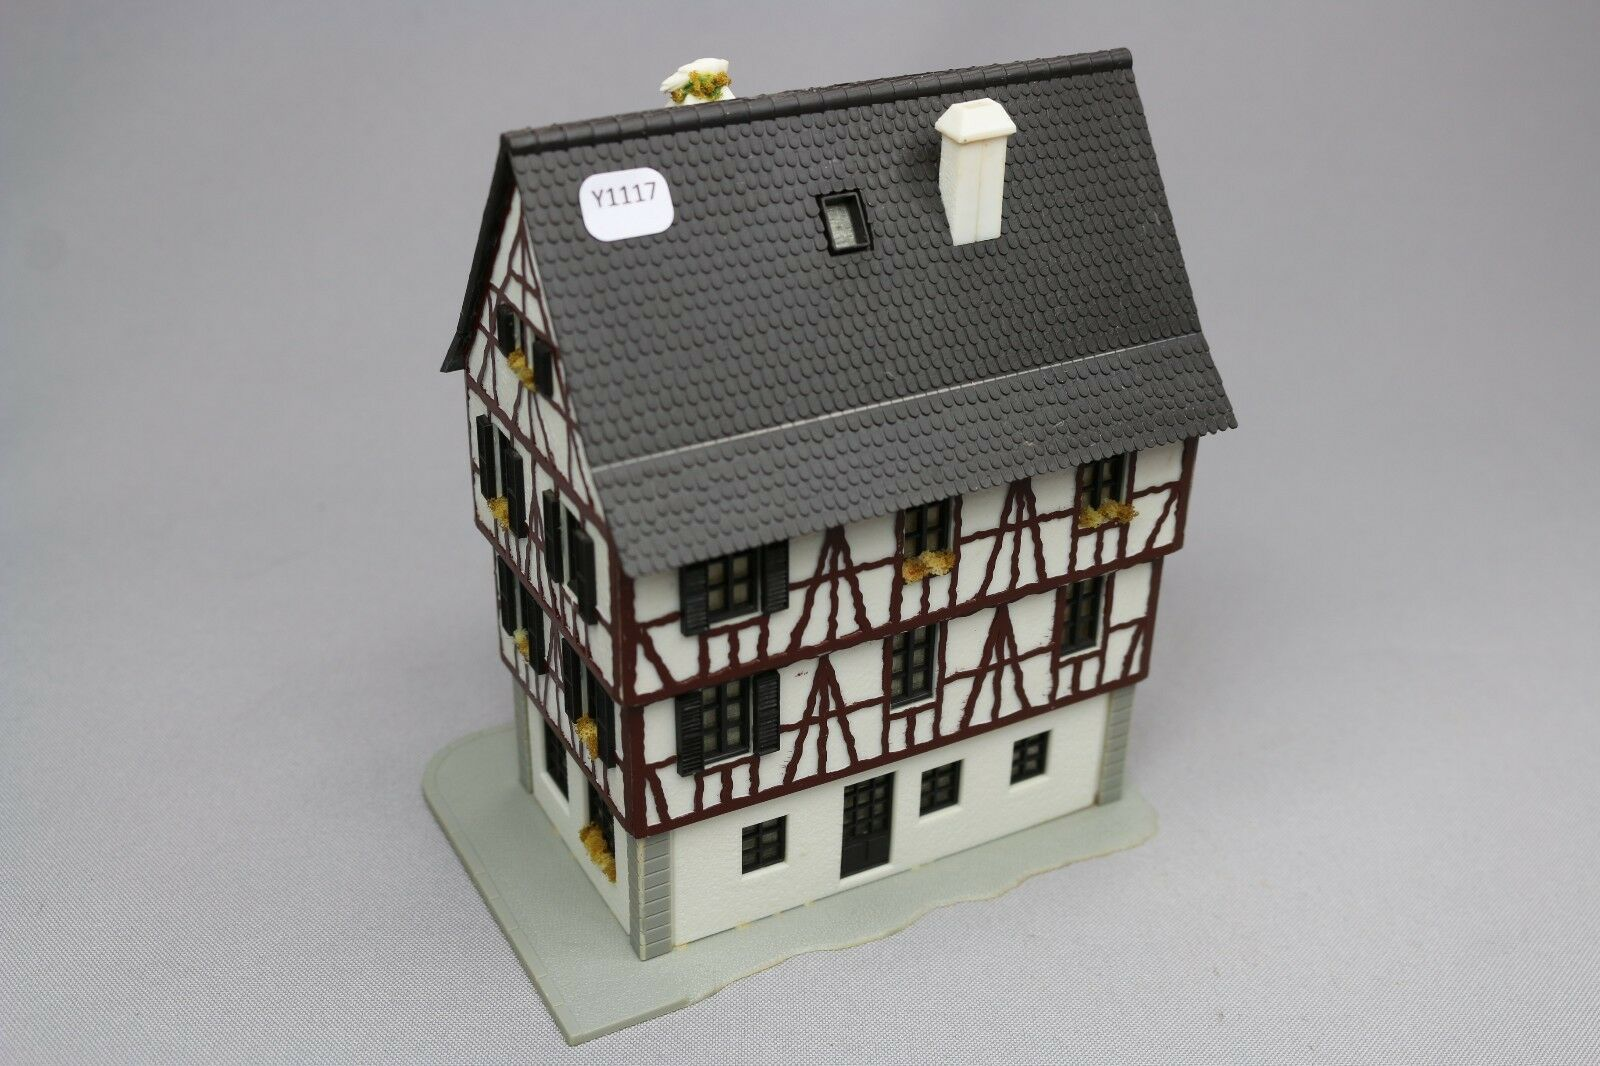 Y1117 Faller maquette Ho grande grande grande maison colombage porche alsacienne 88a341